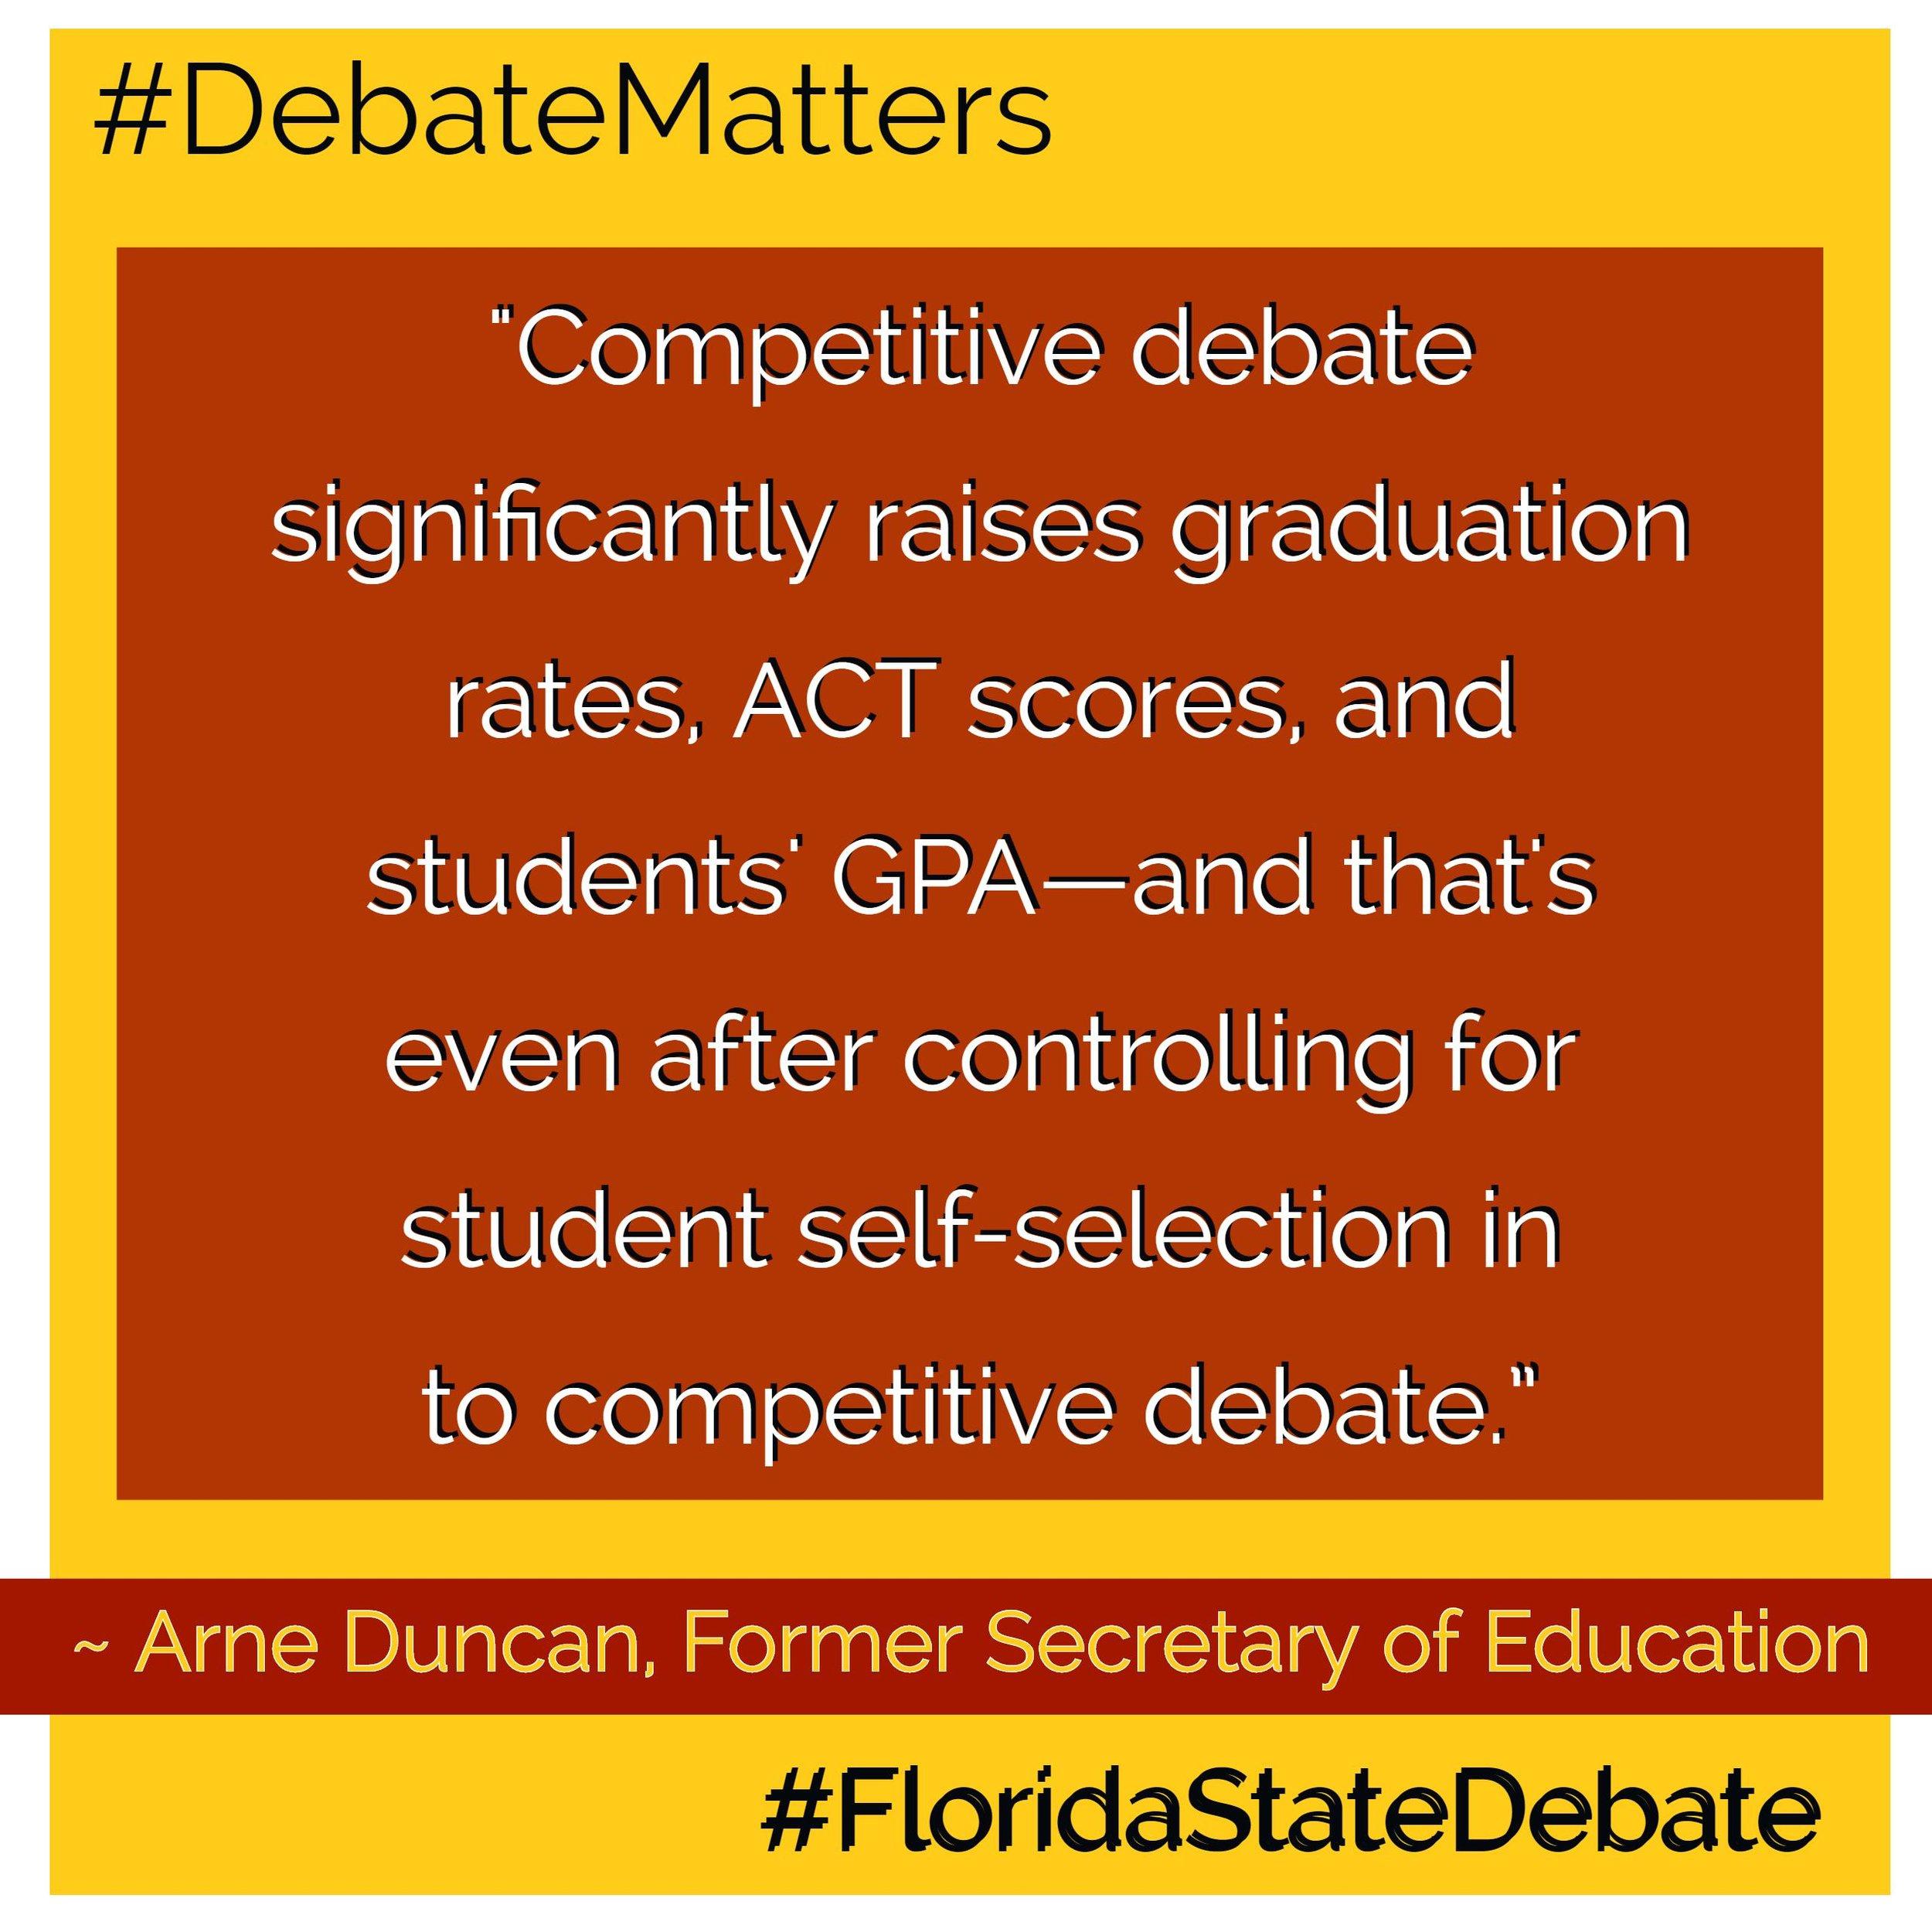 #DebateMatters Arne Duncan